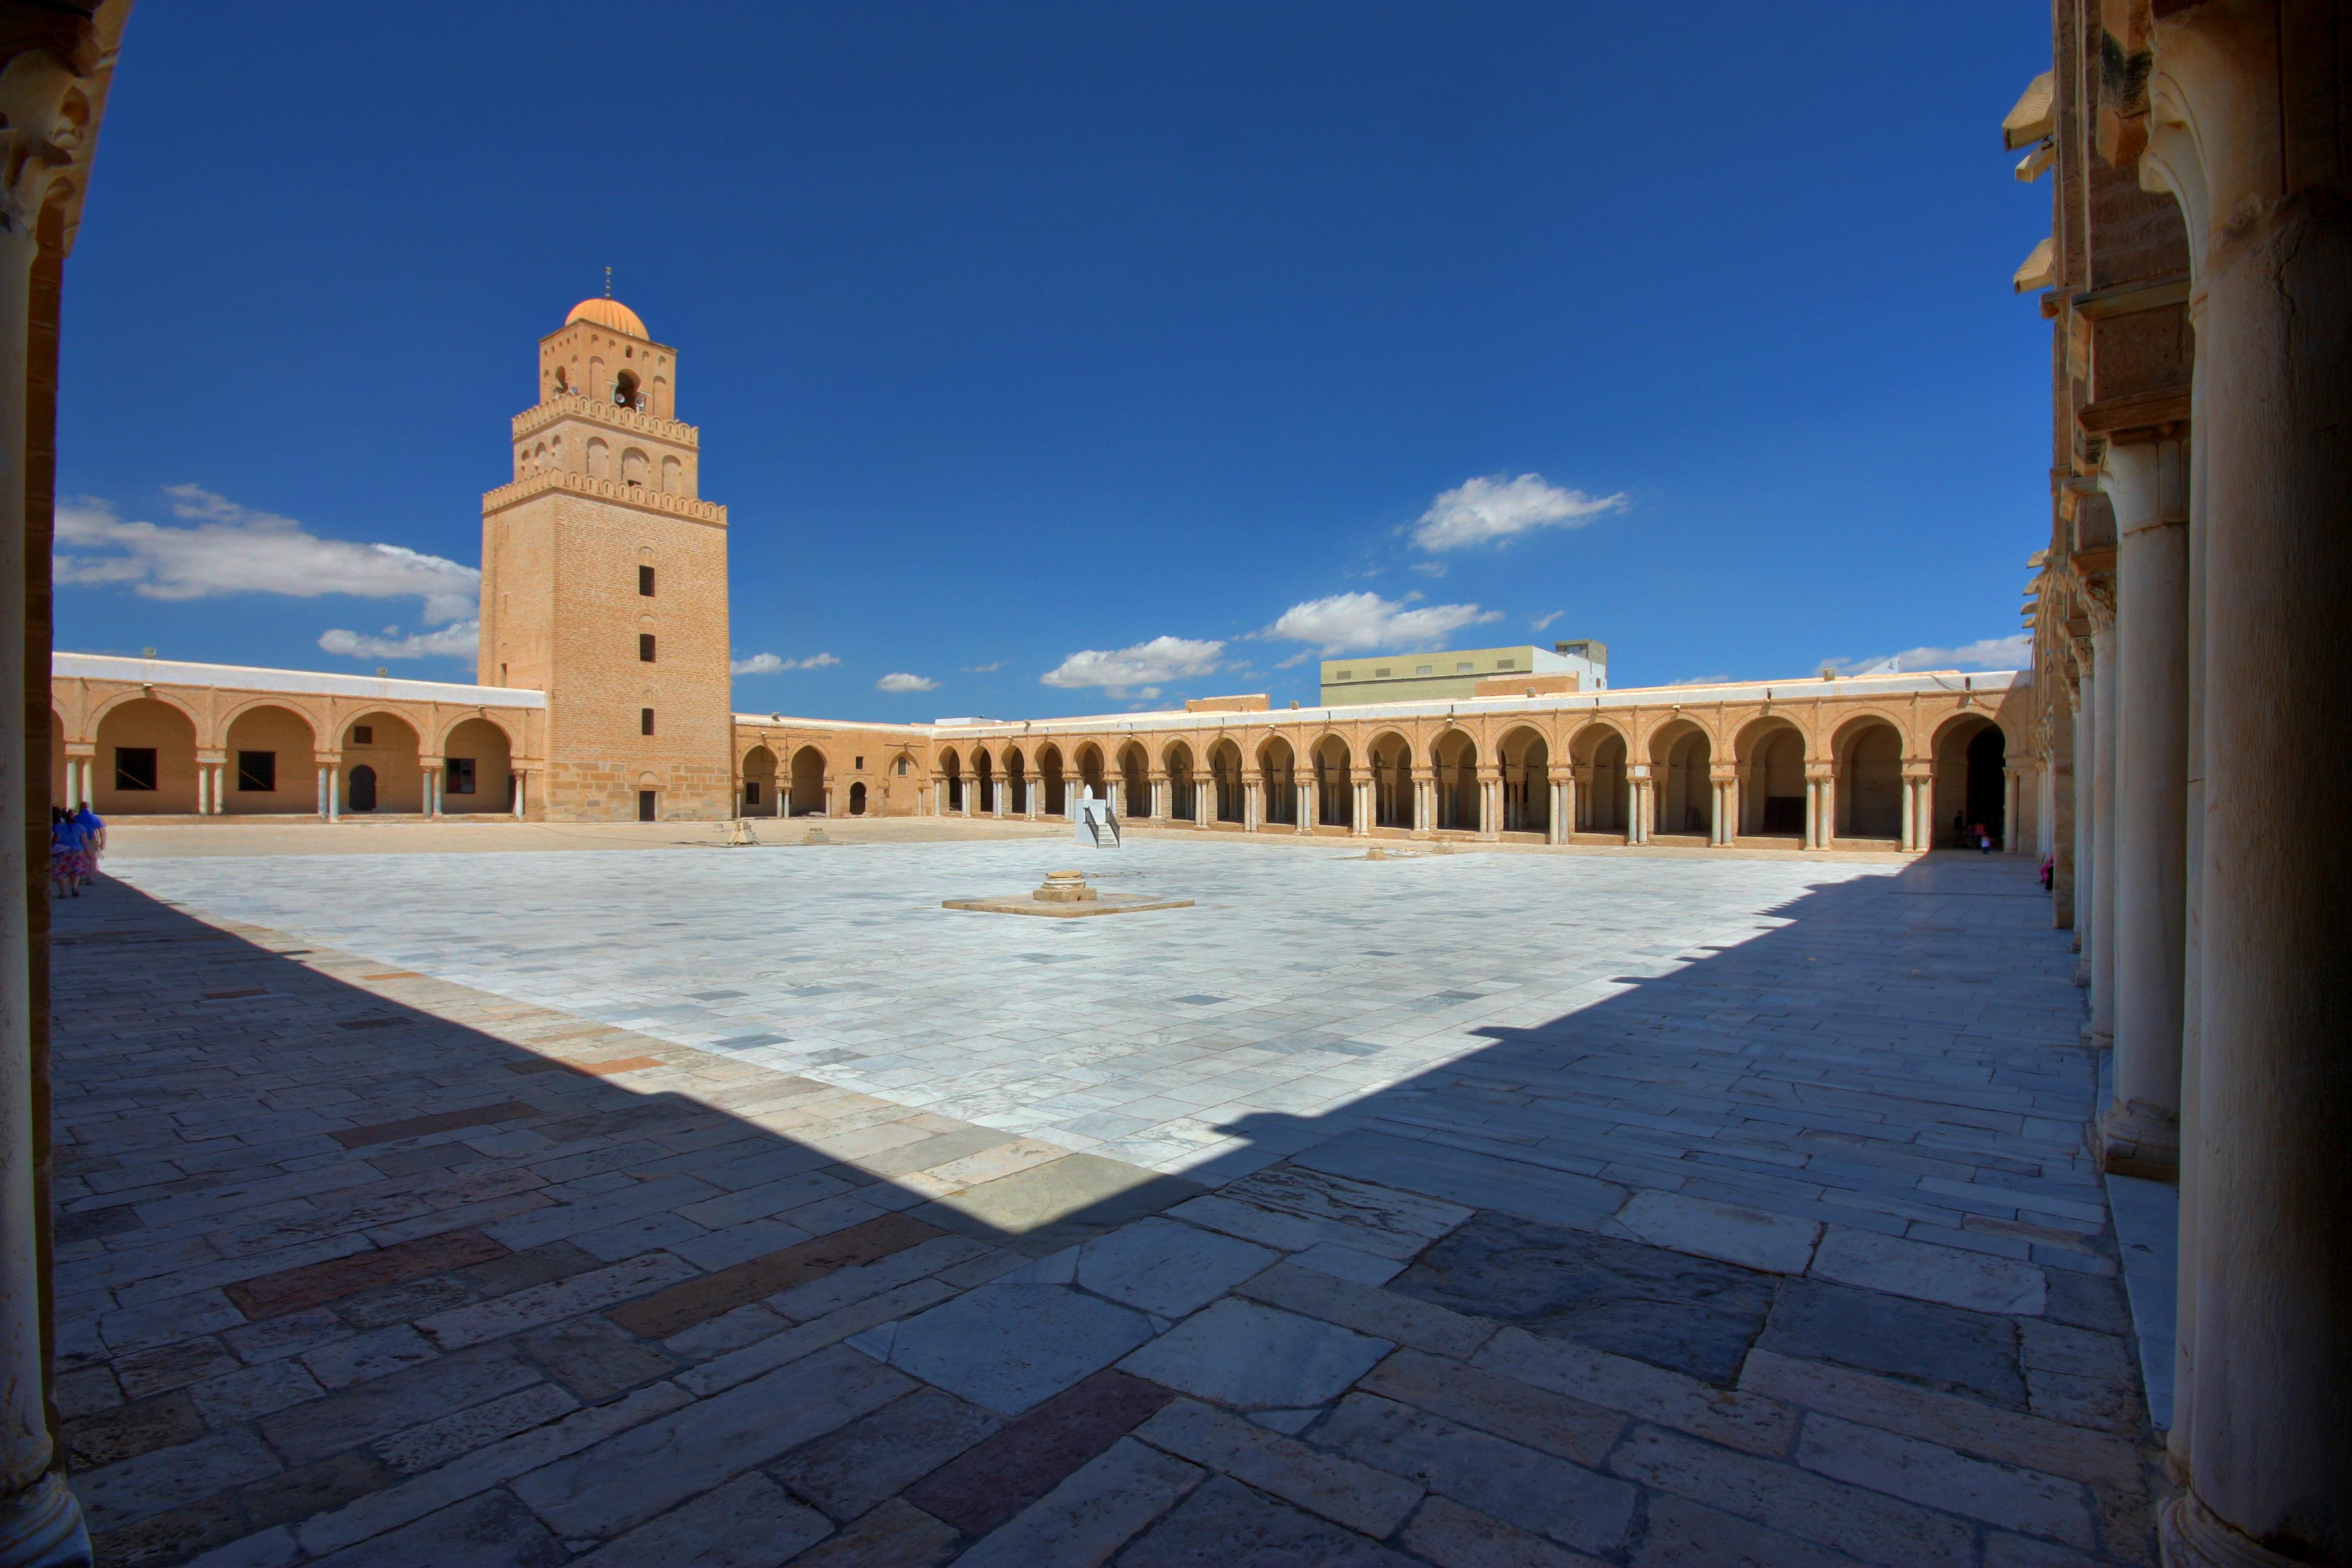 Mosque Kairouan Mosque of Kairouan.jpg